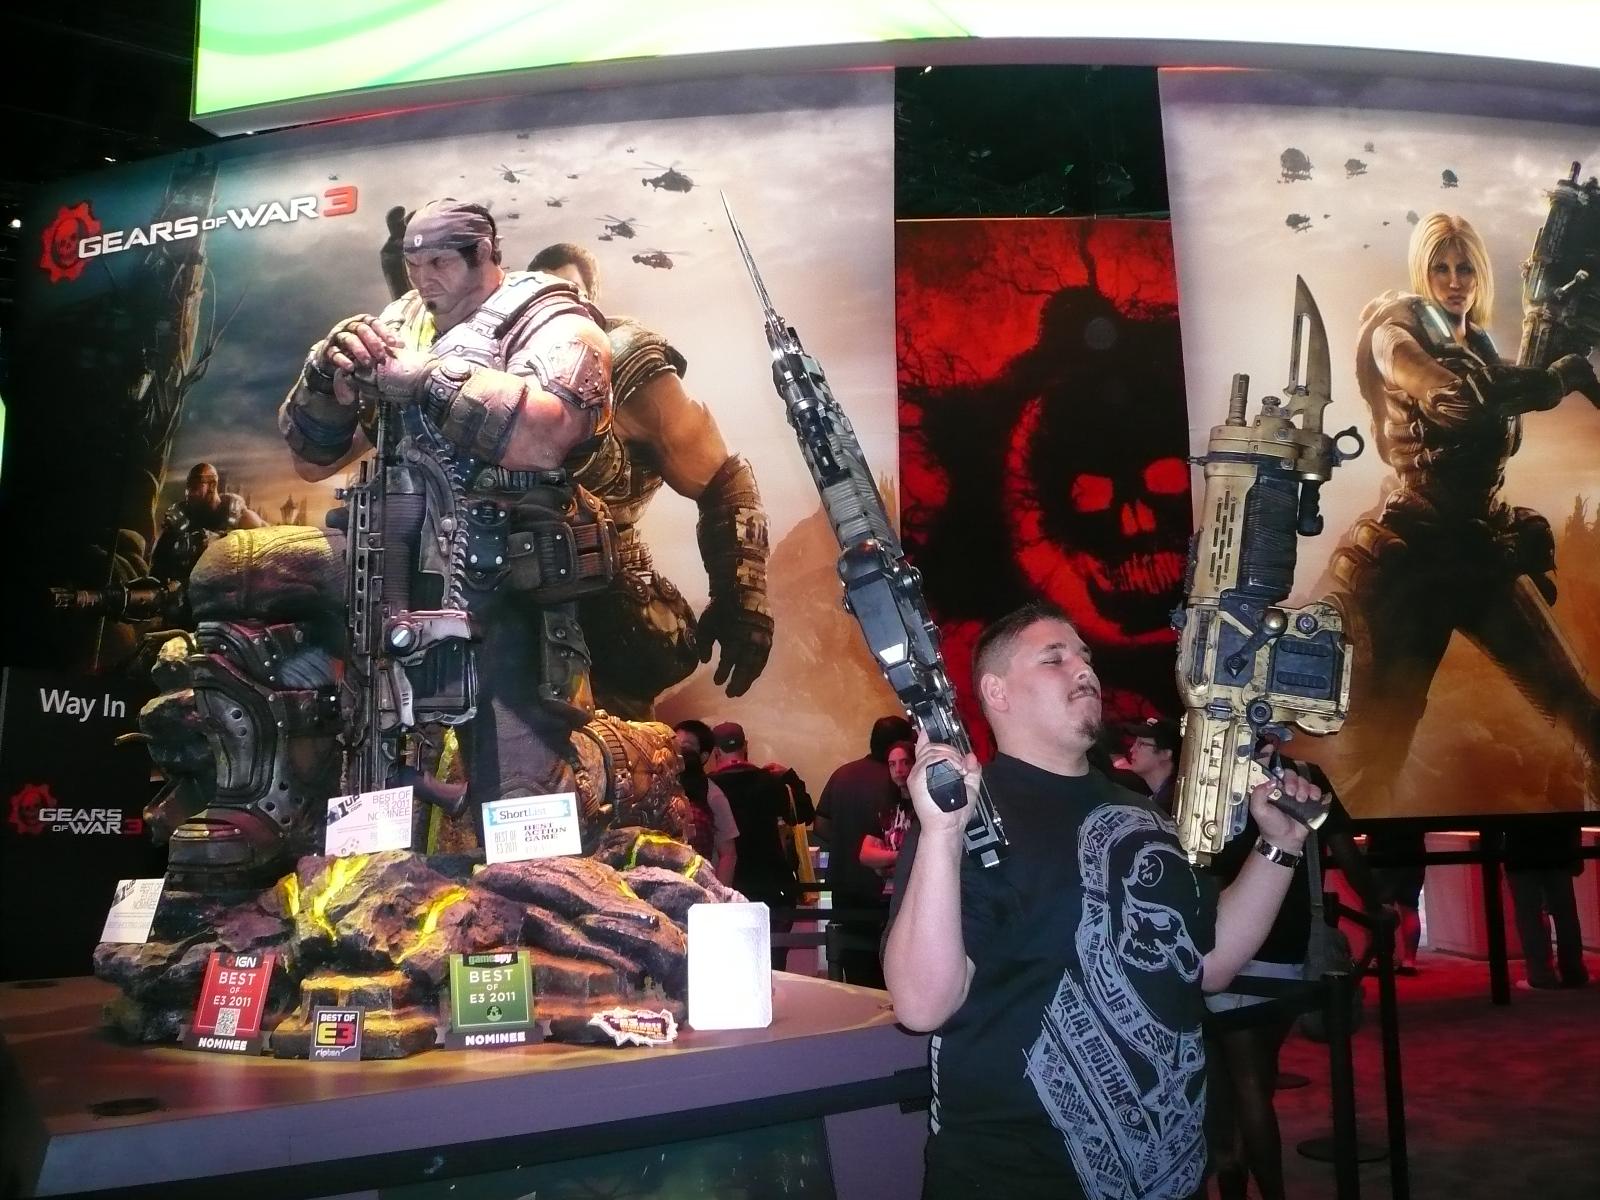 E3 Expo に行ってきました! の巻 (番外写真集)